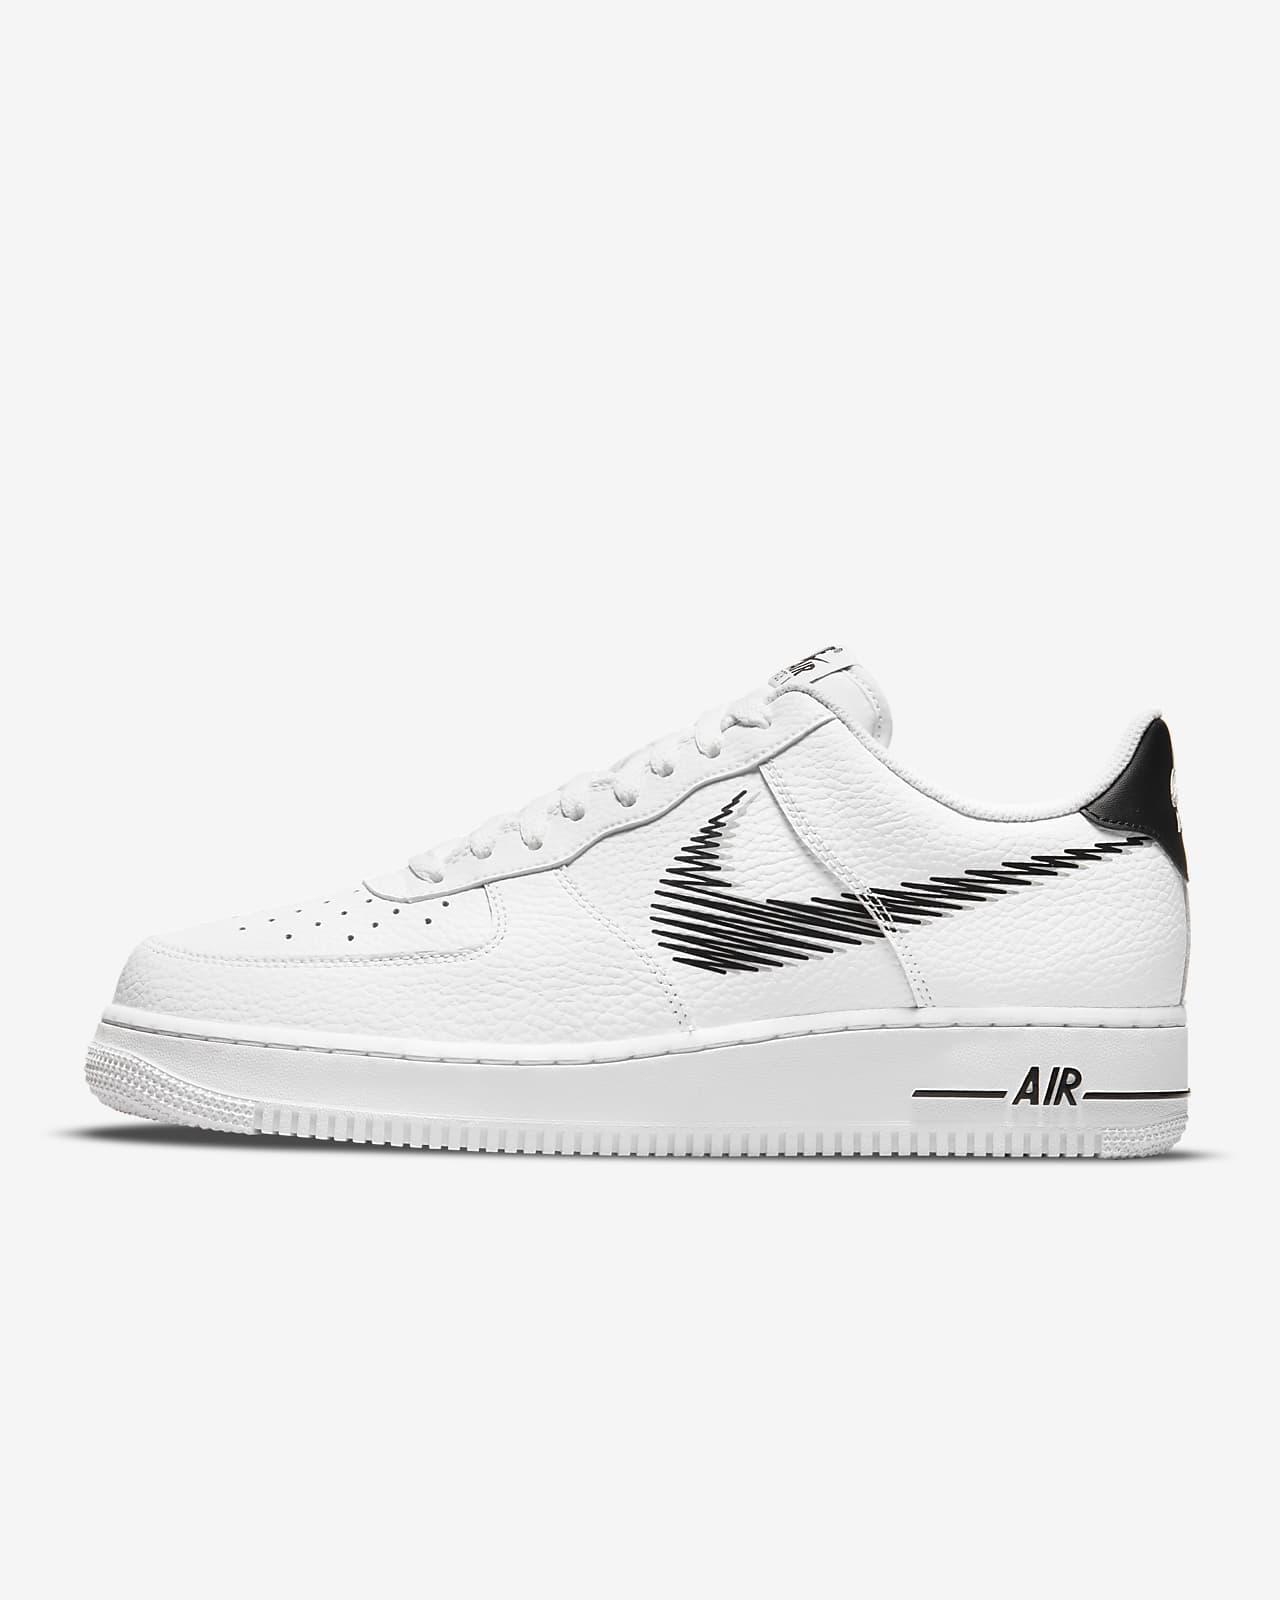 Nike Air Force 1 Low Herrenschuh